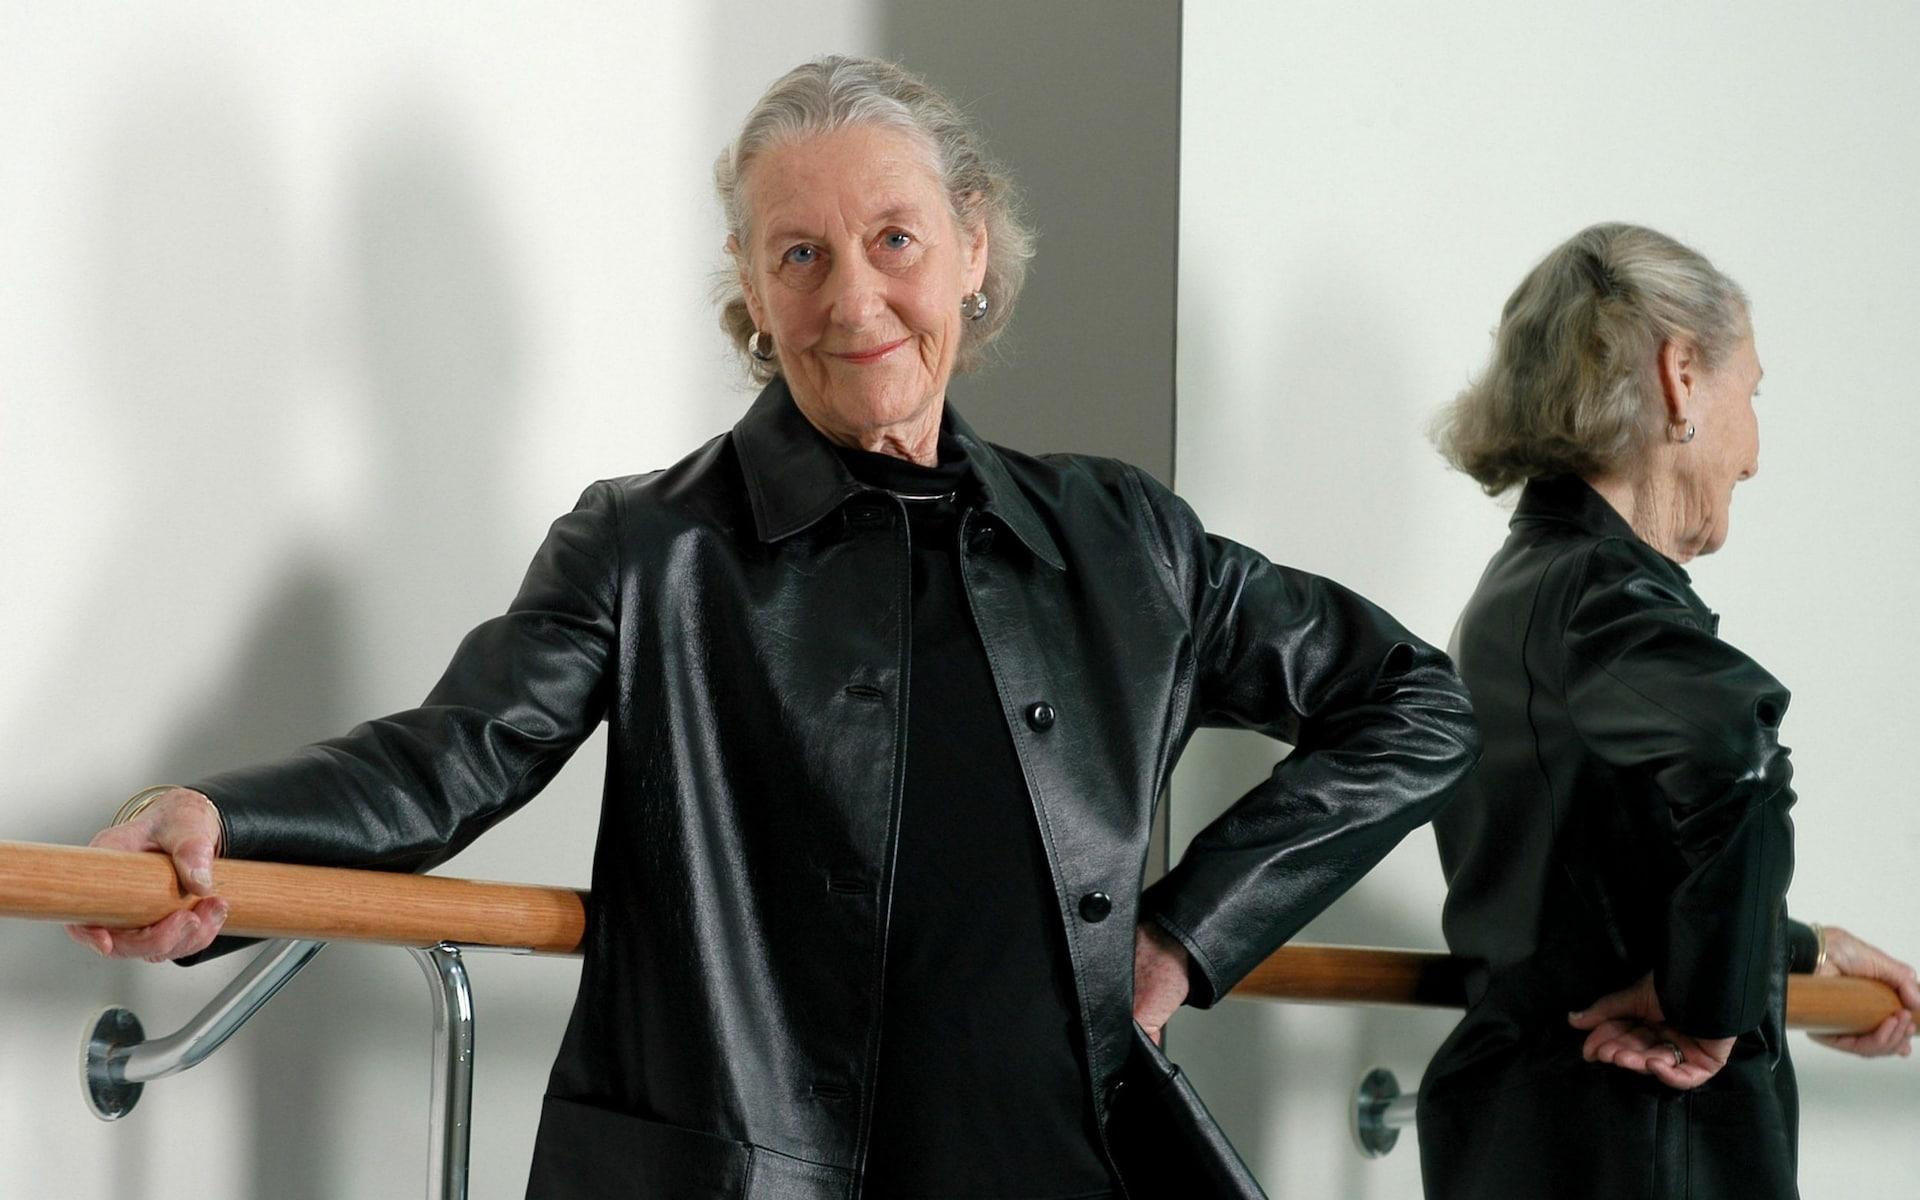 Dame Margaret Scott at the Australian Ballet School in Melbourne in 2004 courtesy THE AGE/FAIRFAX MEDIA